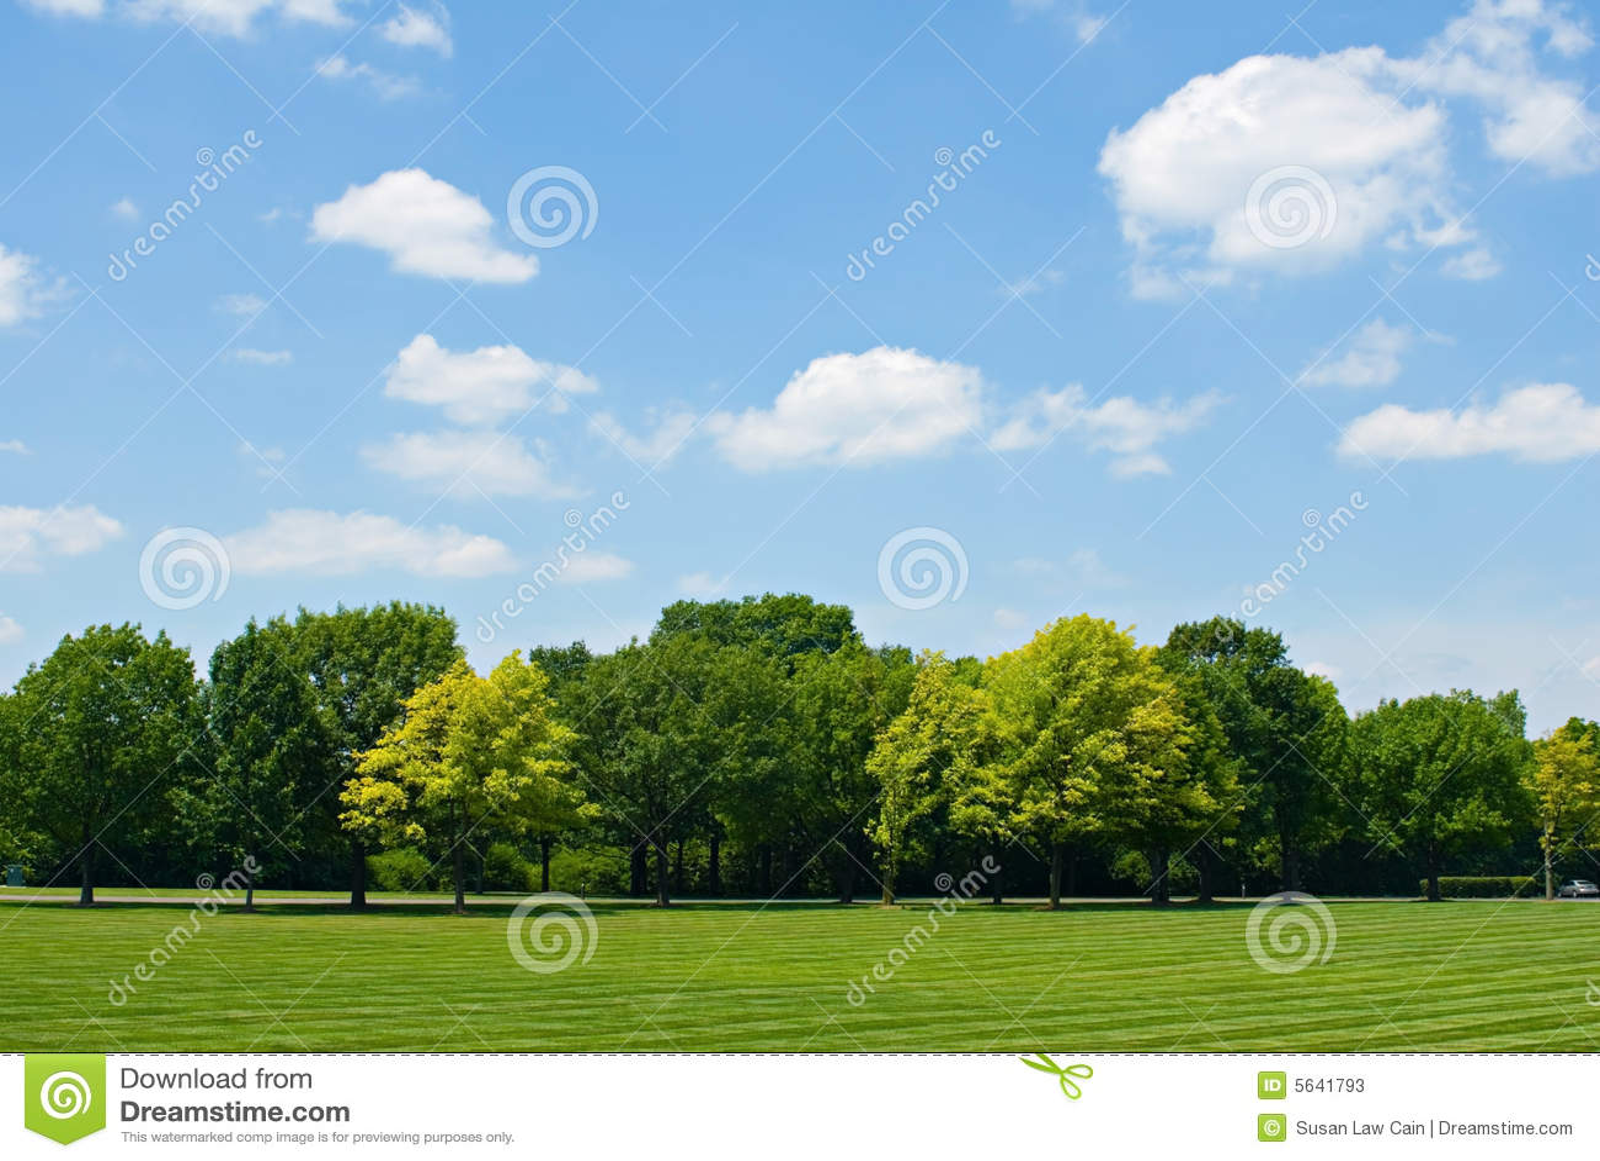 ligne d arbre avec le ciel - Arbre Ciel